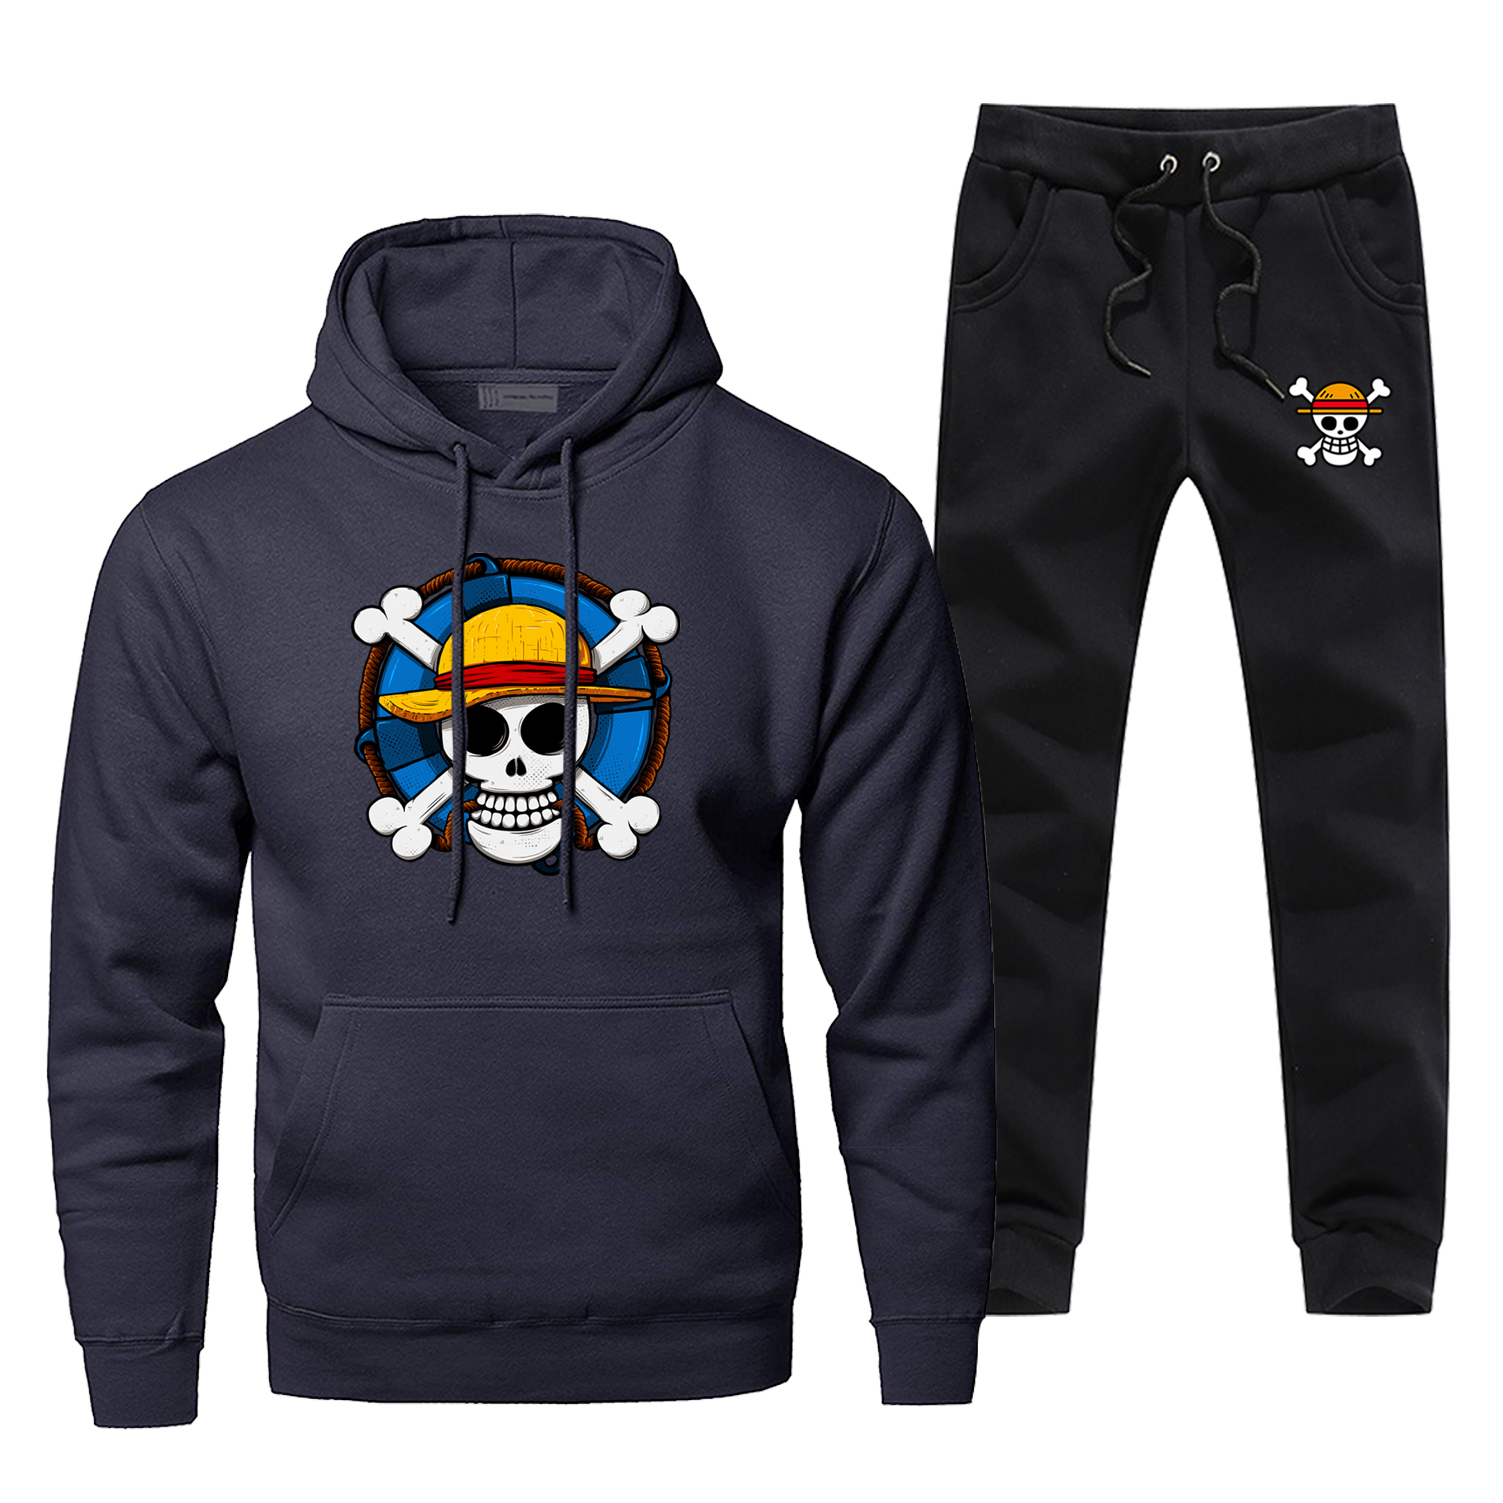 Japanese Anime One Piece Hoodie Men Hoodies+pants Sets Mens The Pirate King Luffy Sportswear Sweatshirt Winter Fleece Tracksuit